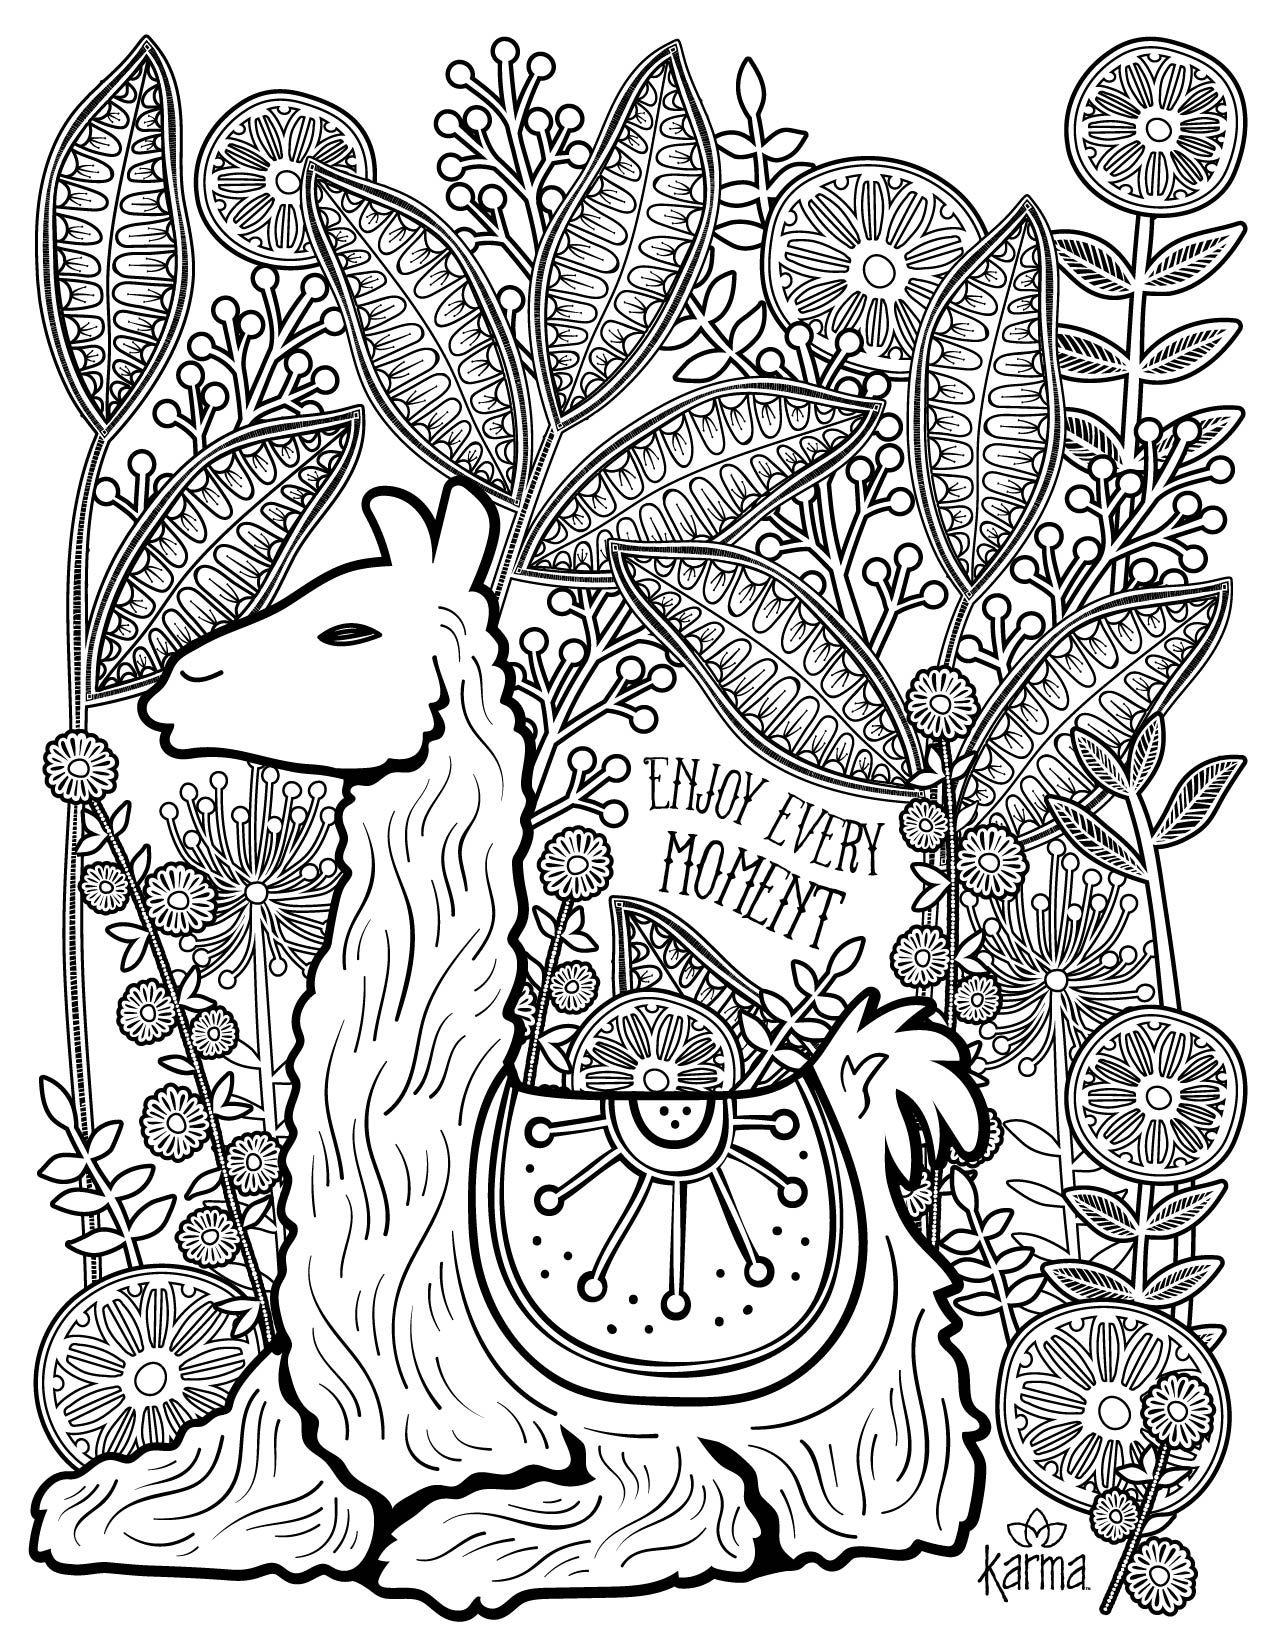 Llamacorn Coloring Pages At Getdrawings